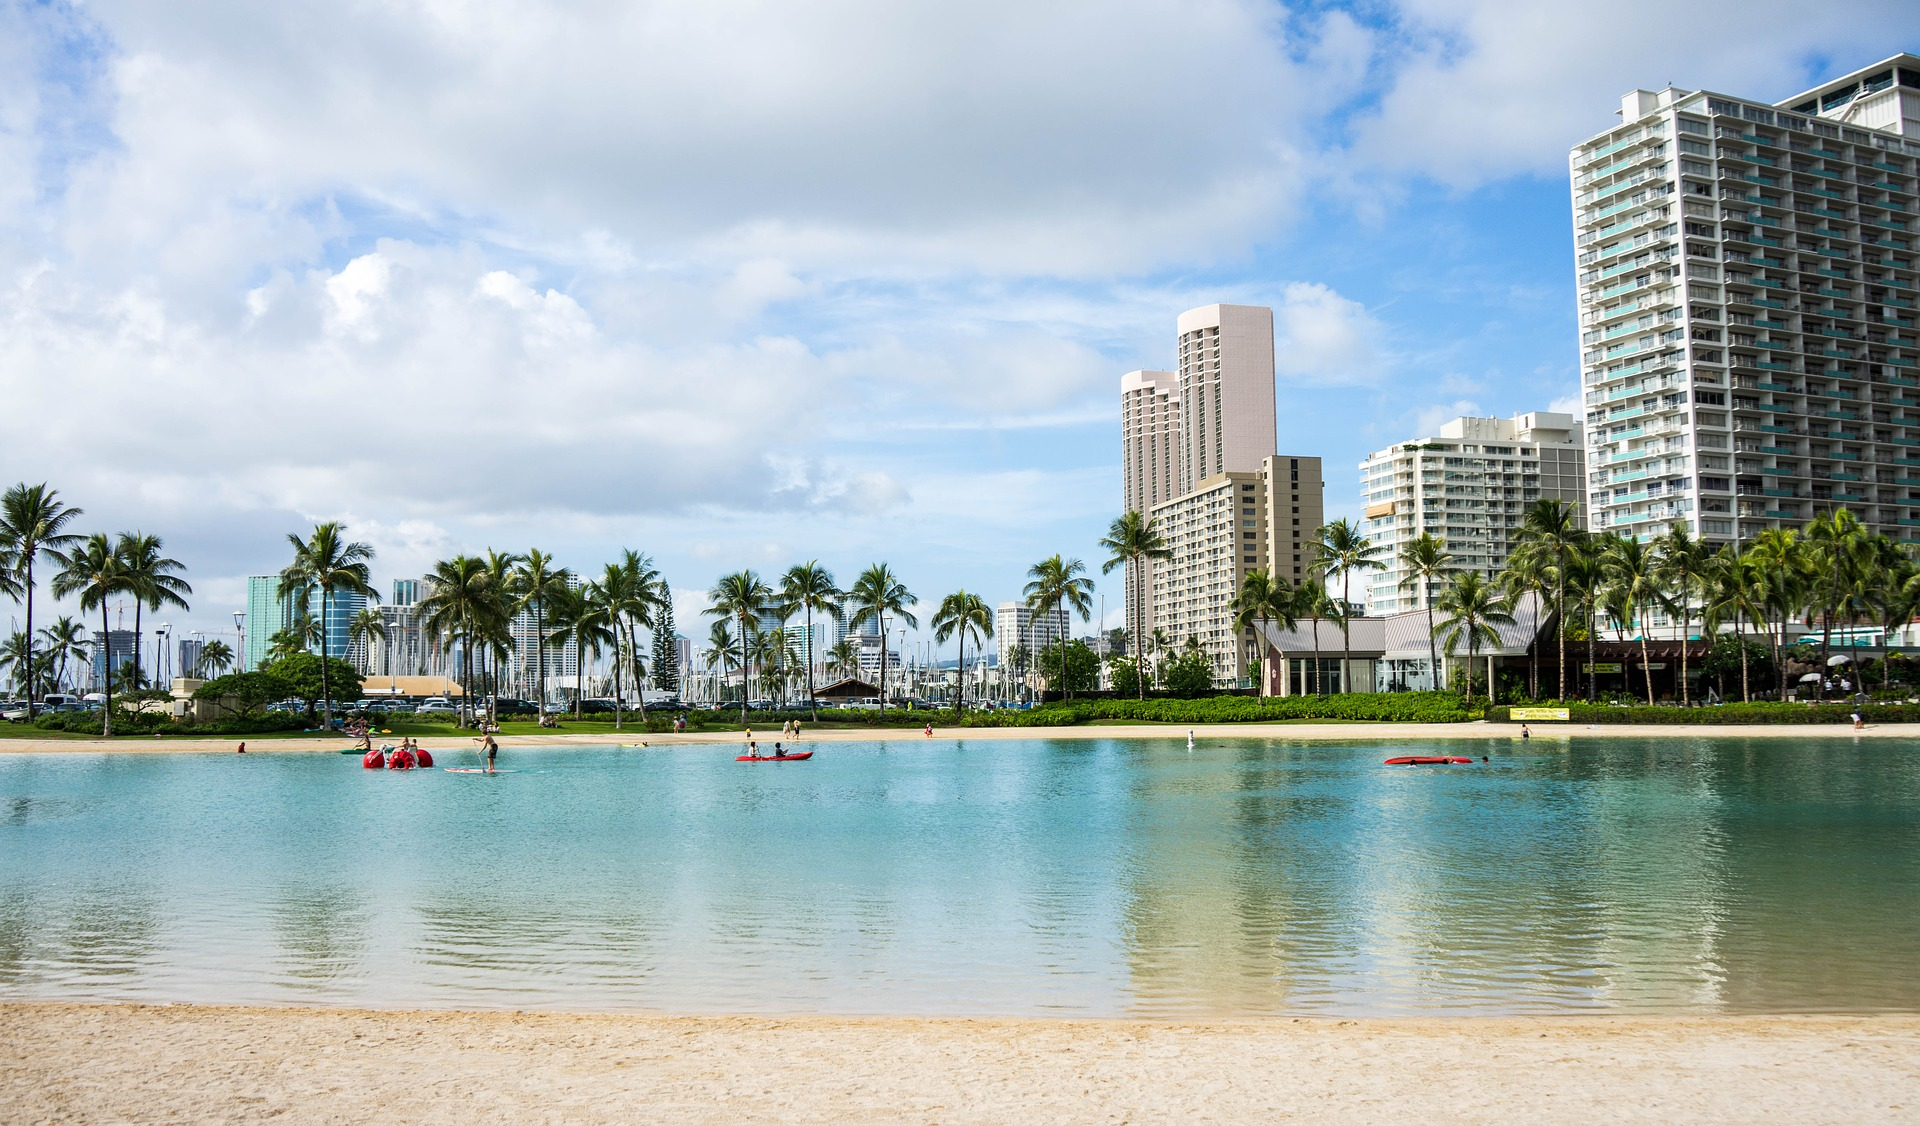 Waikiki Beach, Diamond Head, Honolulu, Hawaii